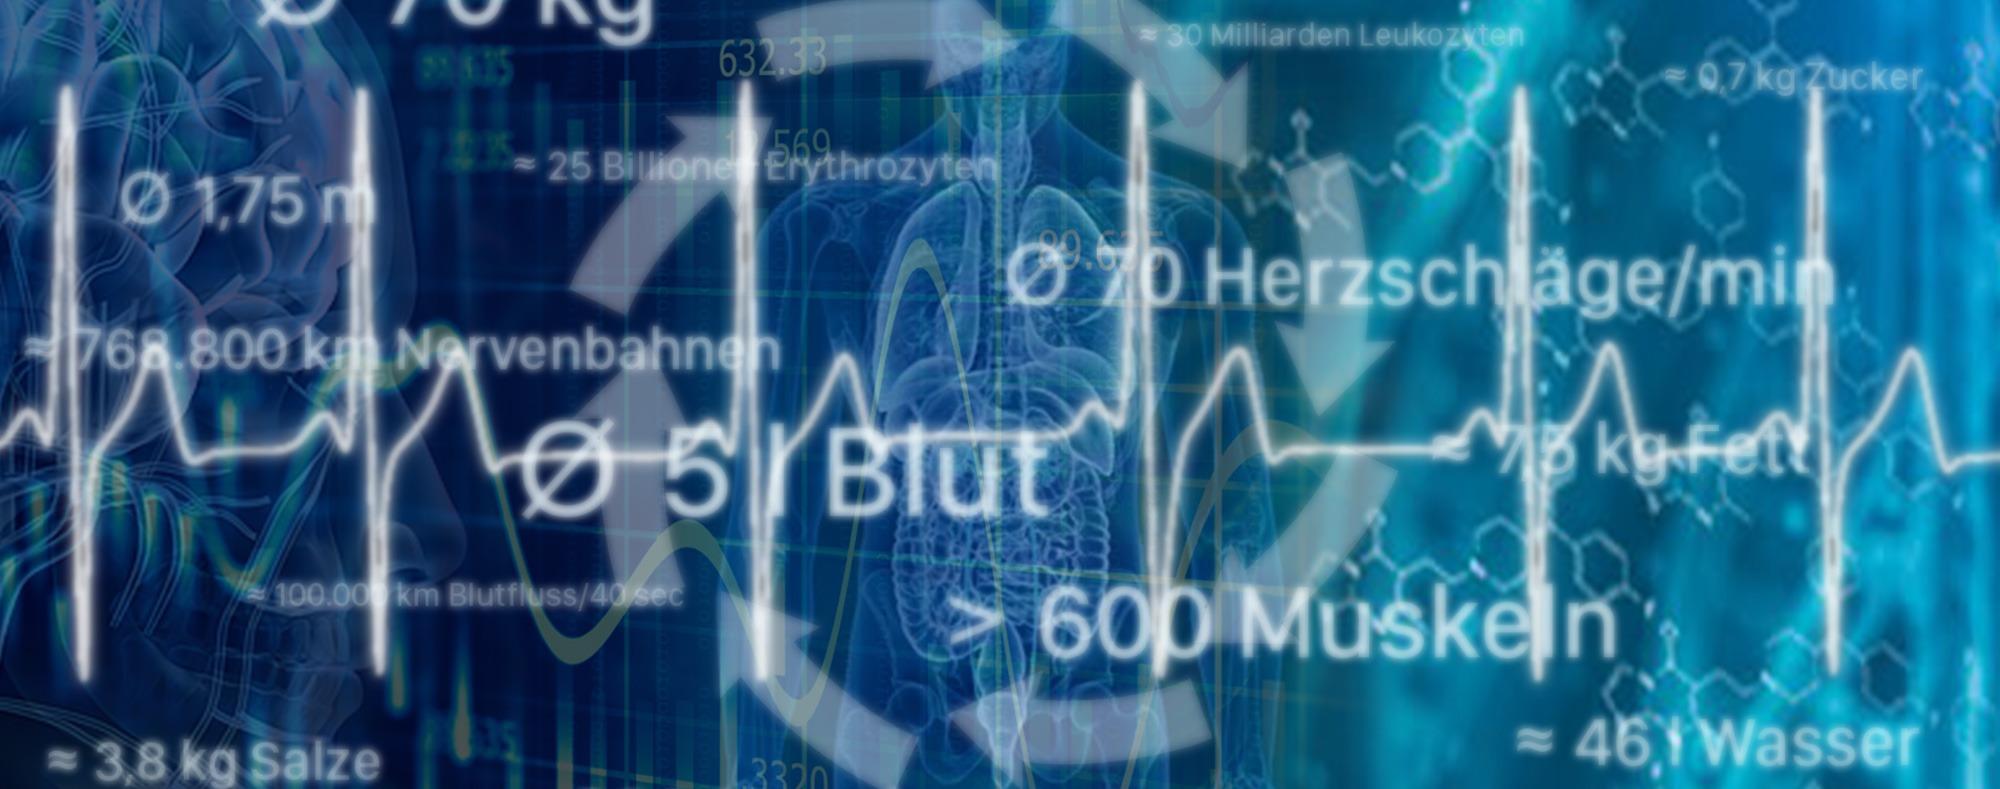 Biofeedback und HRV